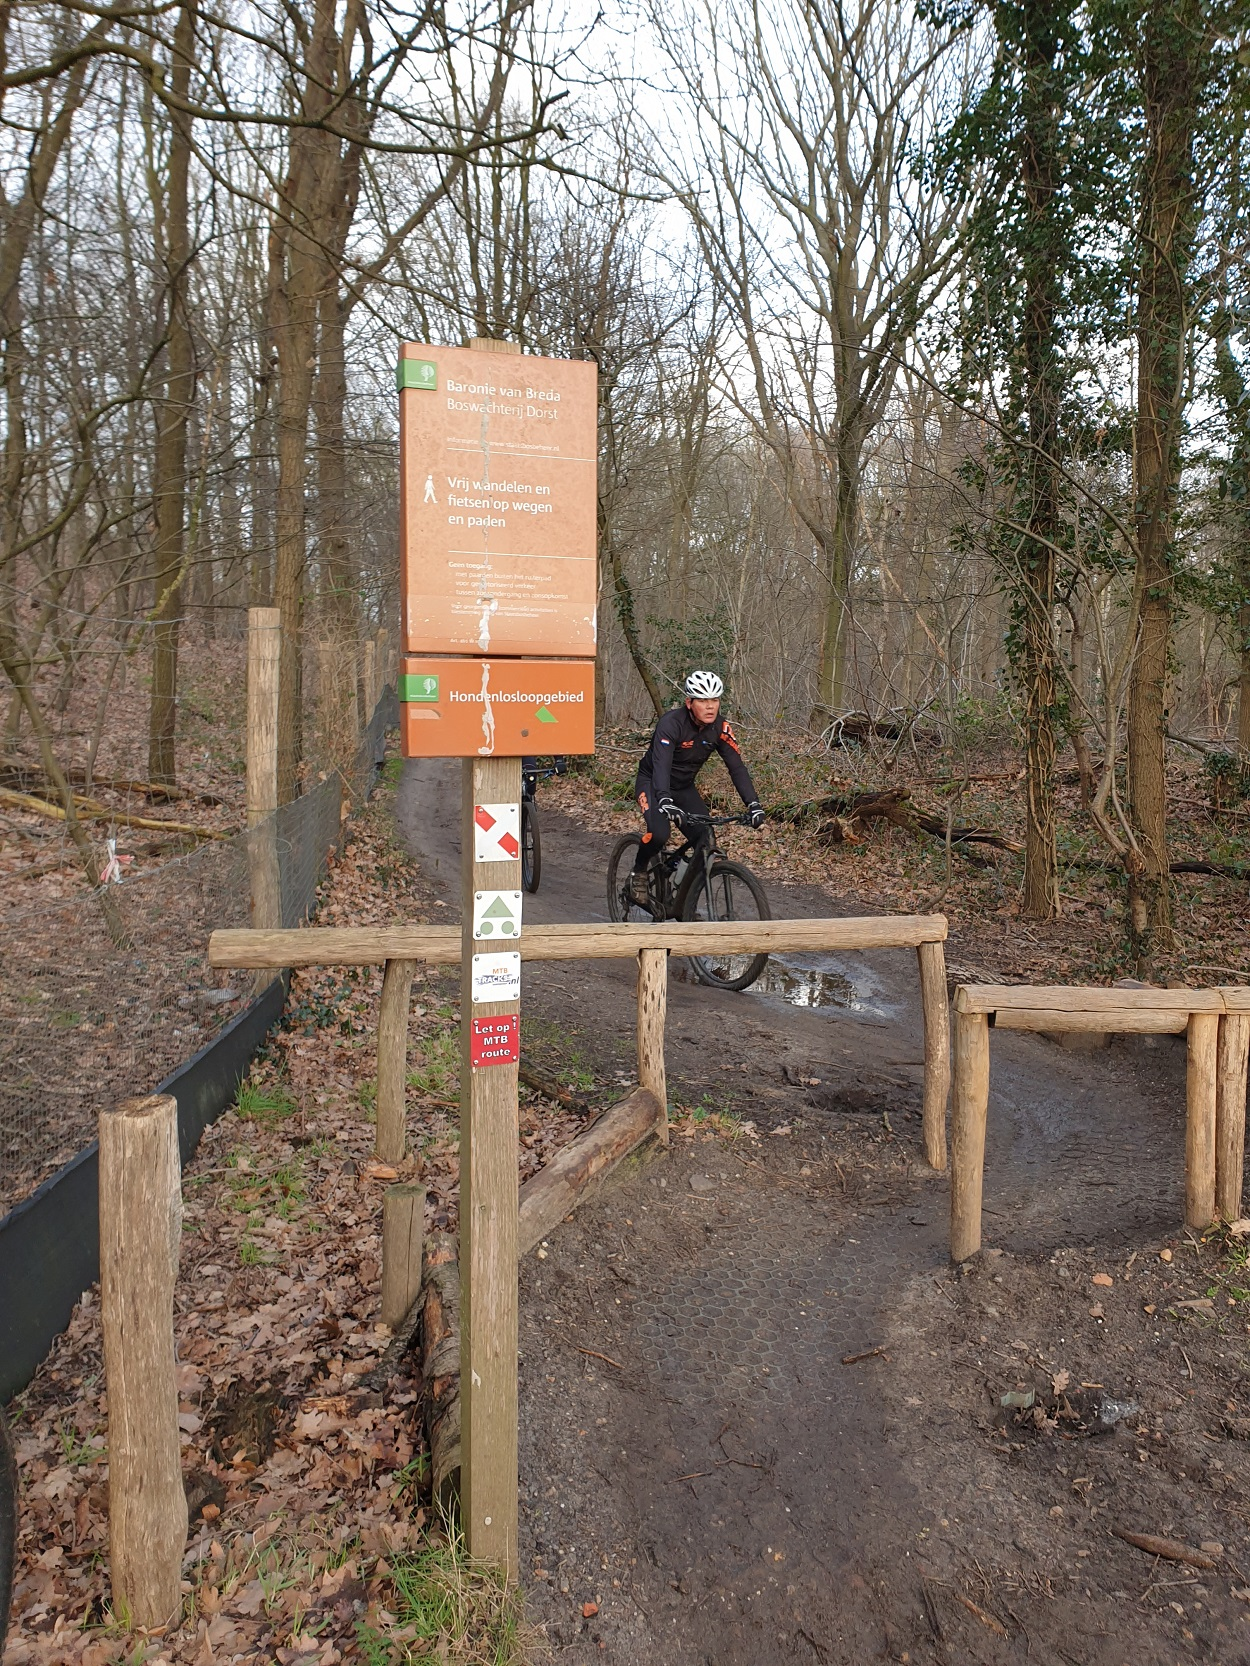 Mountainbikeroute Dorst Oosterhout